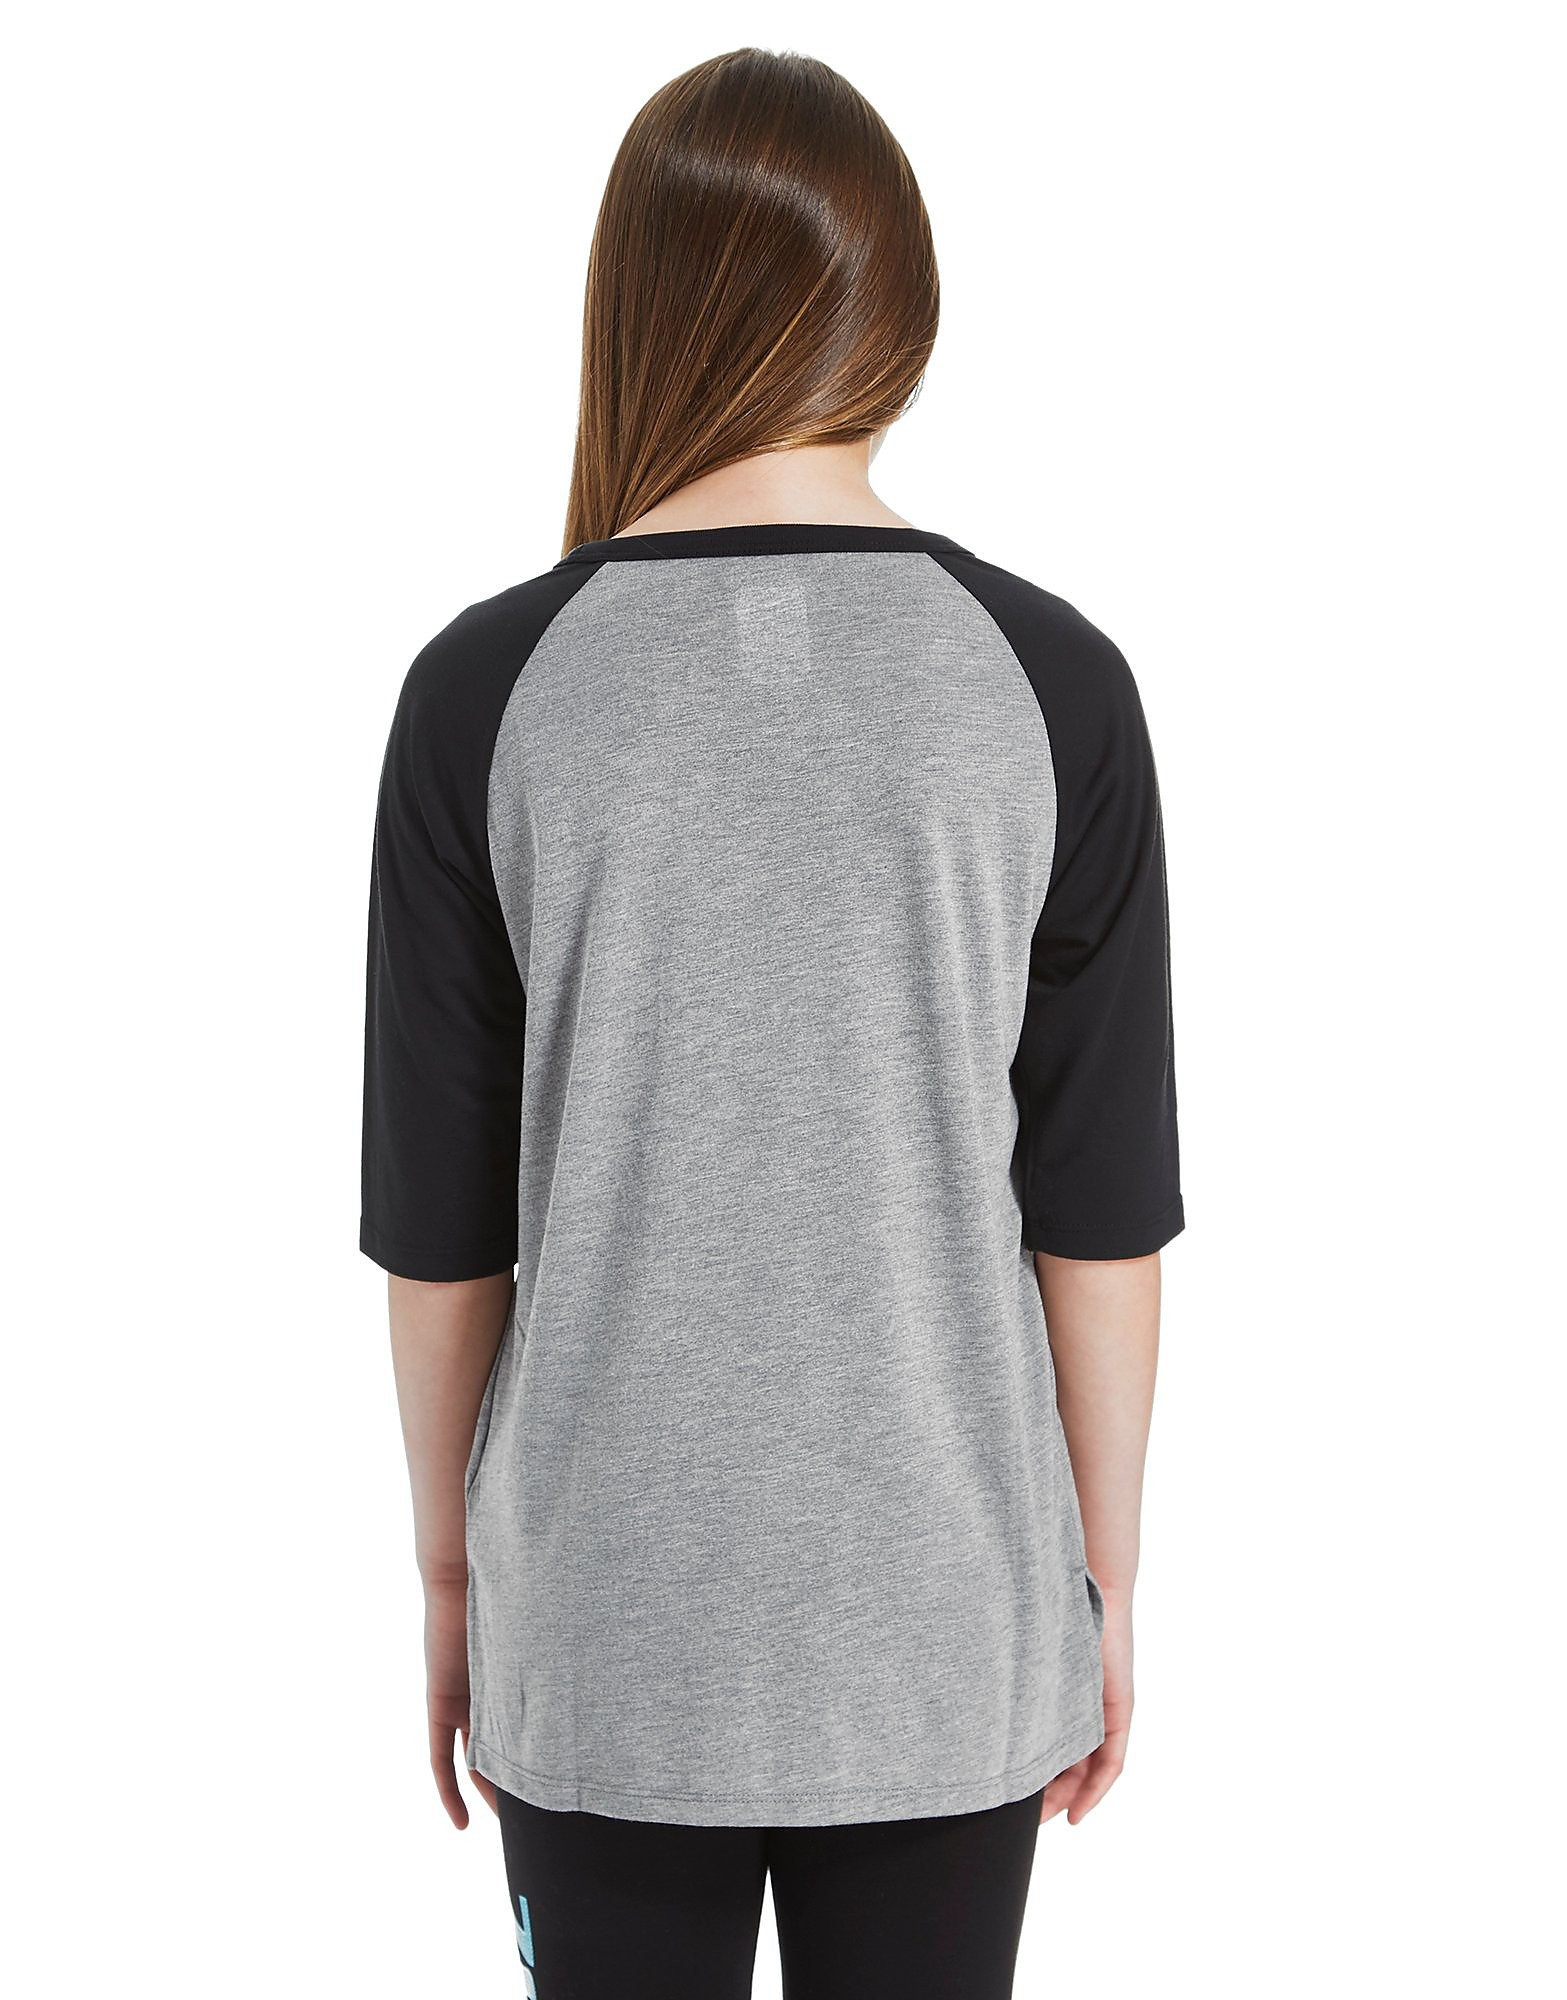 Nike Girls' Lounge T-Shirt Junior